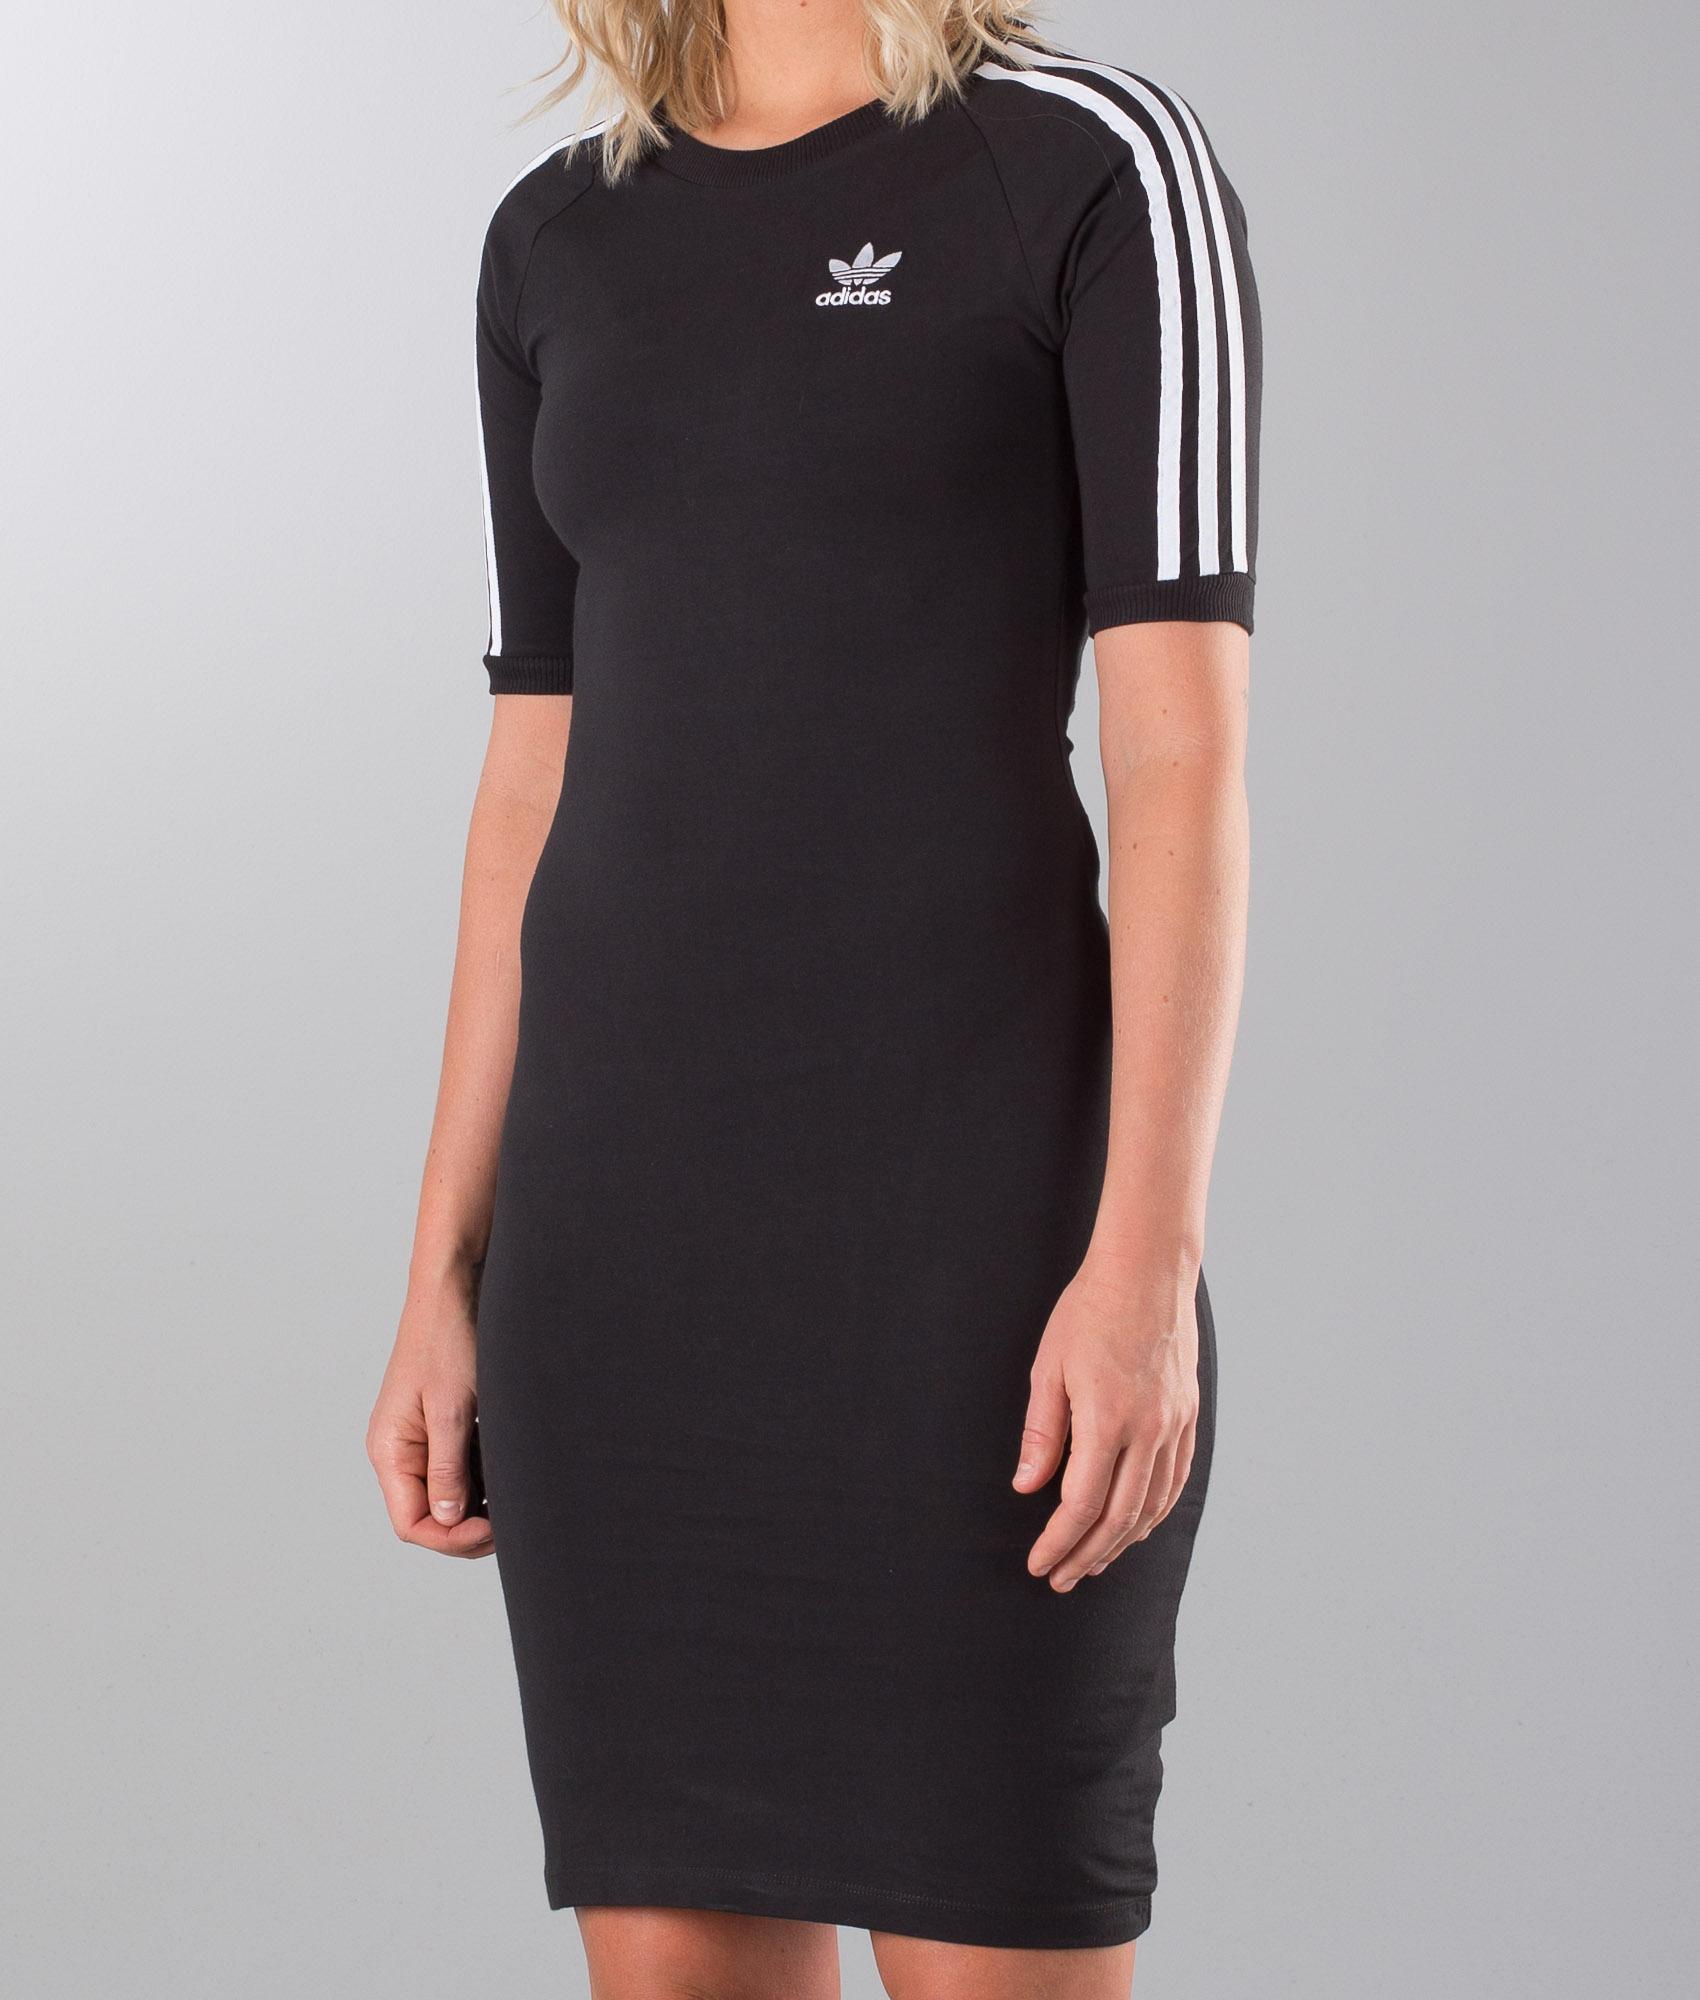 Black Adidas Originals Kleid Stripes Dress Ridestore ch 3 QrdtsCxh